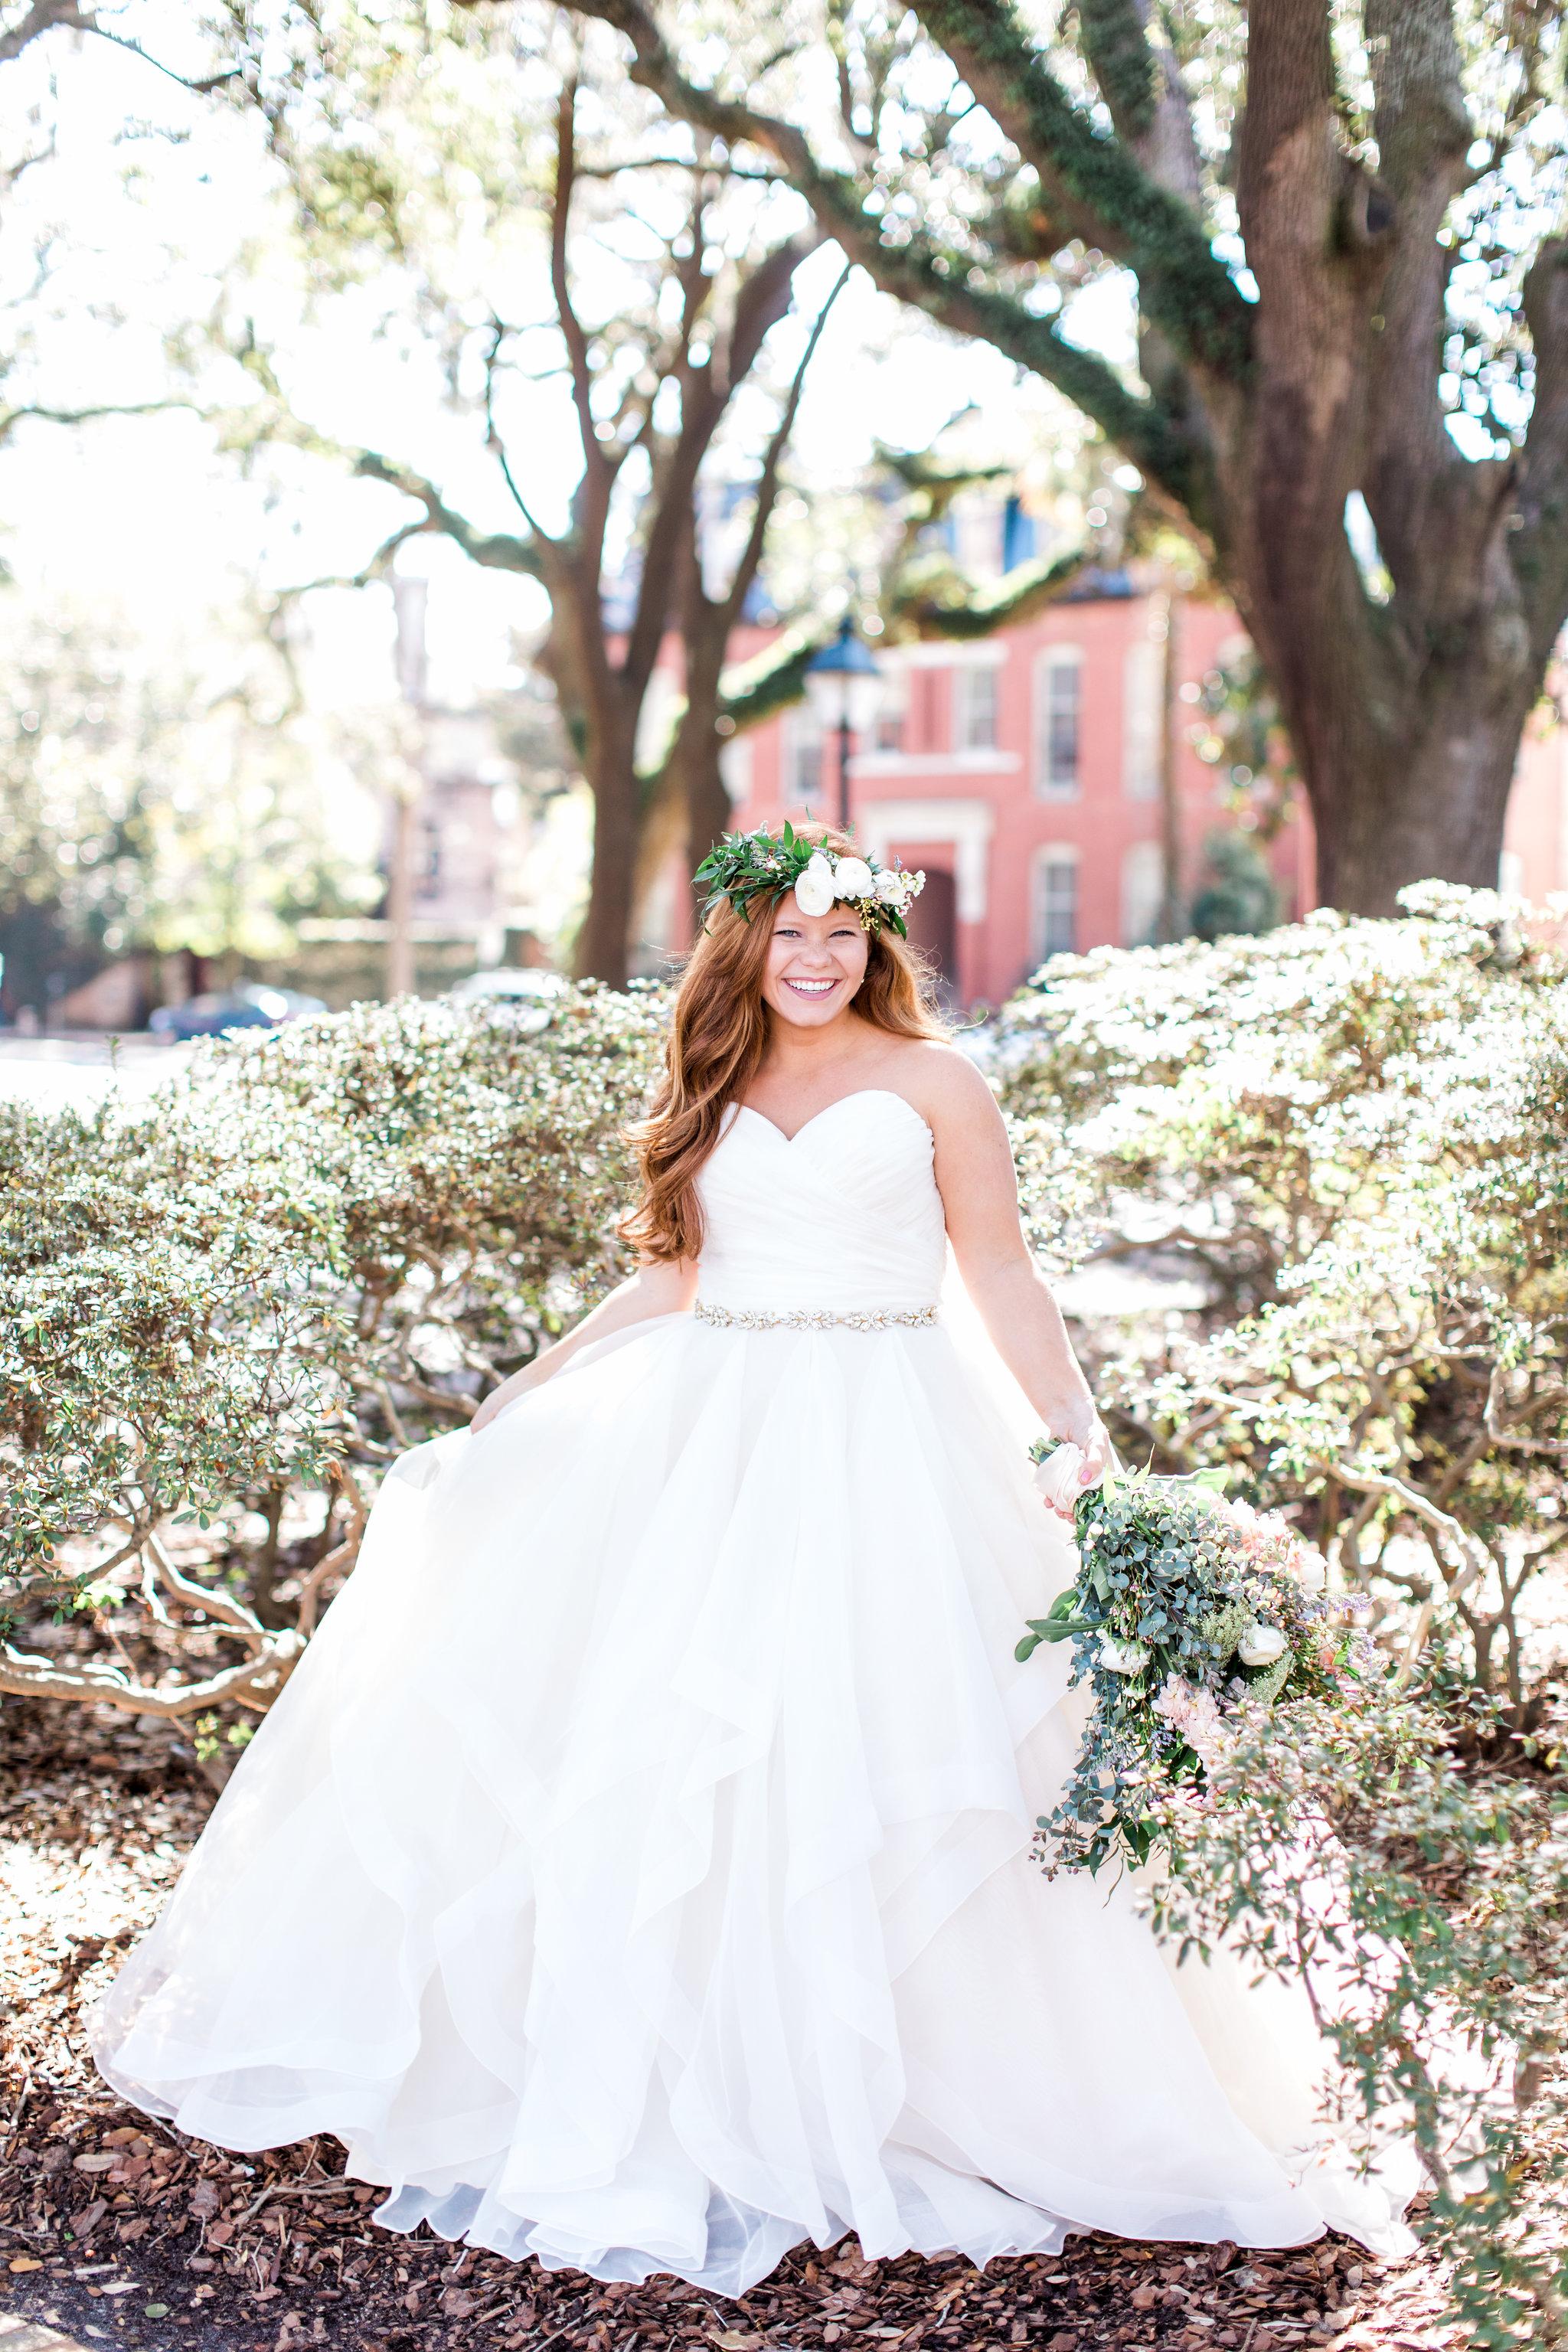 apt-b-photography-mary-elizabeths-bridal-boutique-adele-amelia-accessories-morilee-5504-savannah-bridal-boutique-savannah-weddings-savannah-wedding-photographer-savannah-bridal-gowns-savannah-wedding-dresses-historic-savannah-wedding-9.jpg